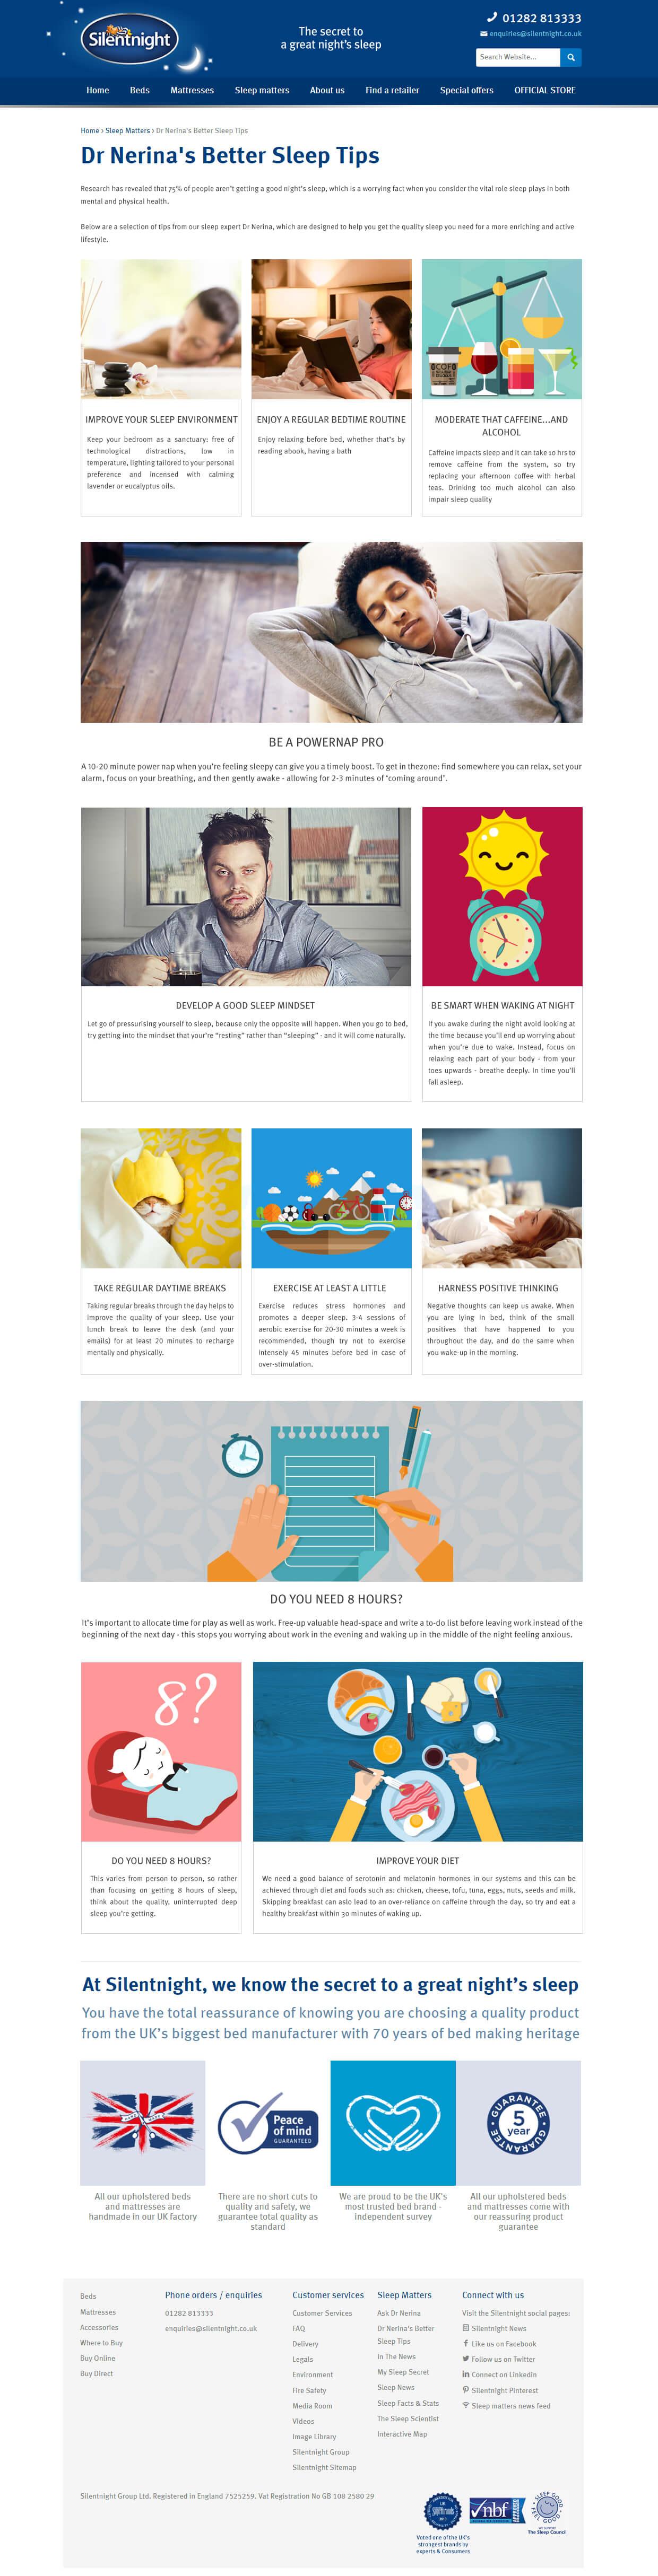 sleep-matters-dr-nerinas-better-sleep-tips.jpg